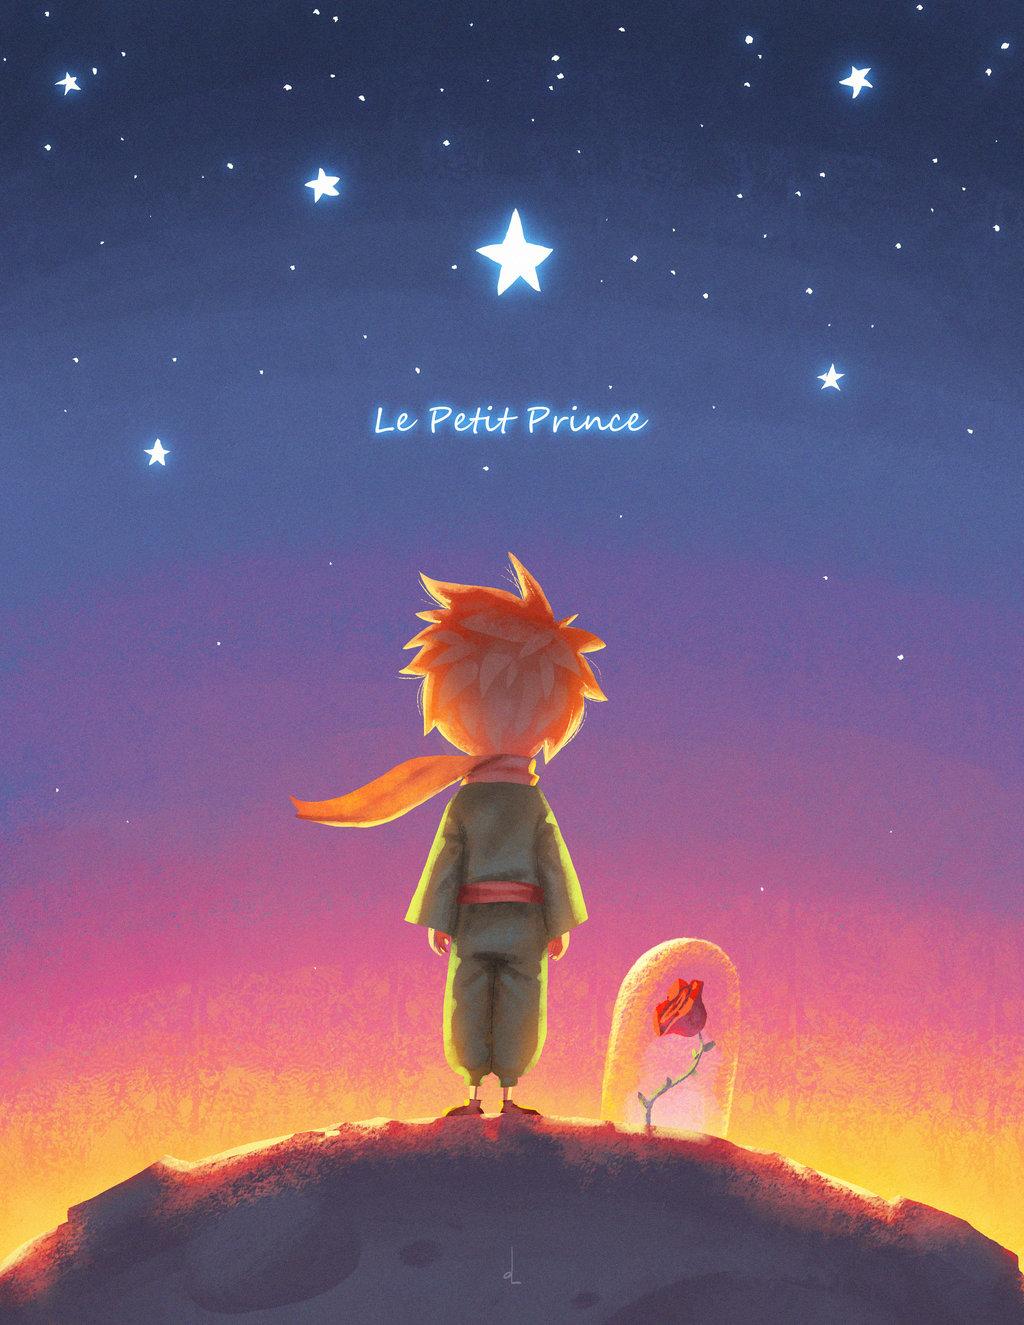 Фото Маленький принц, by omarito